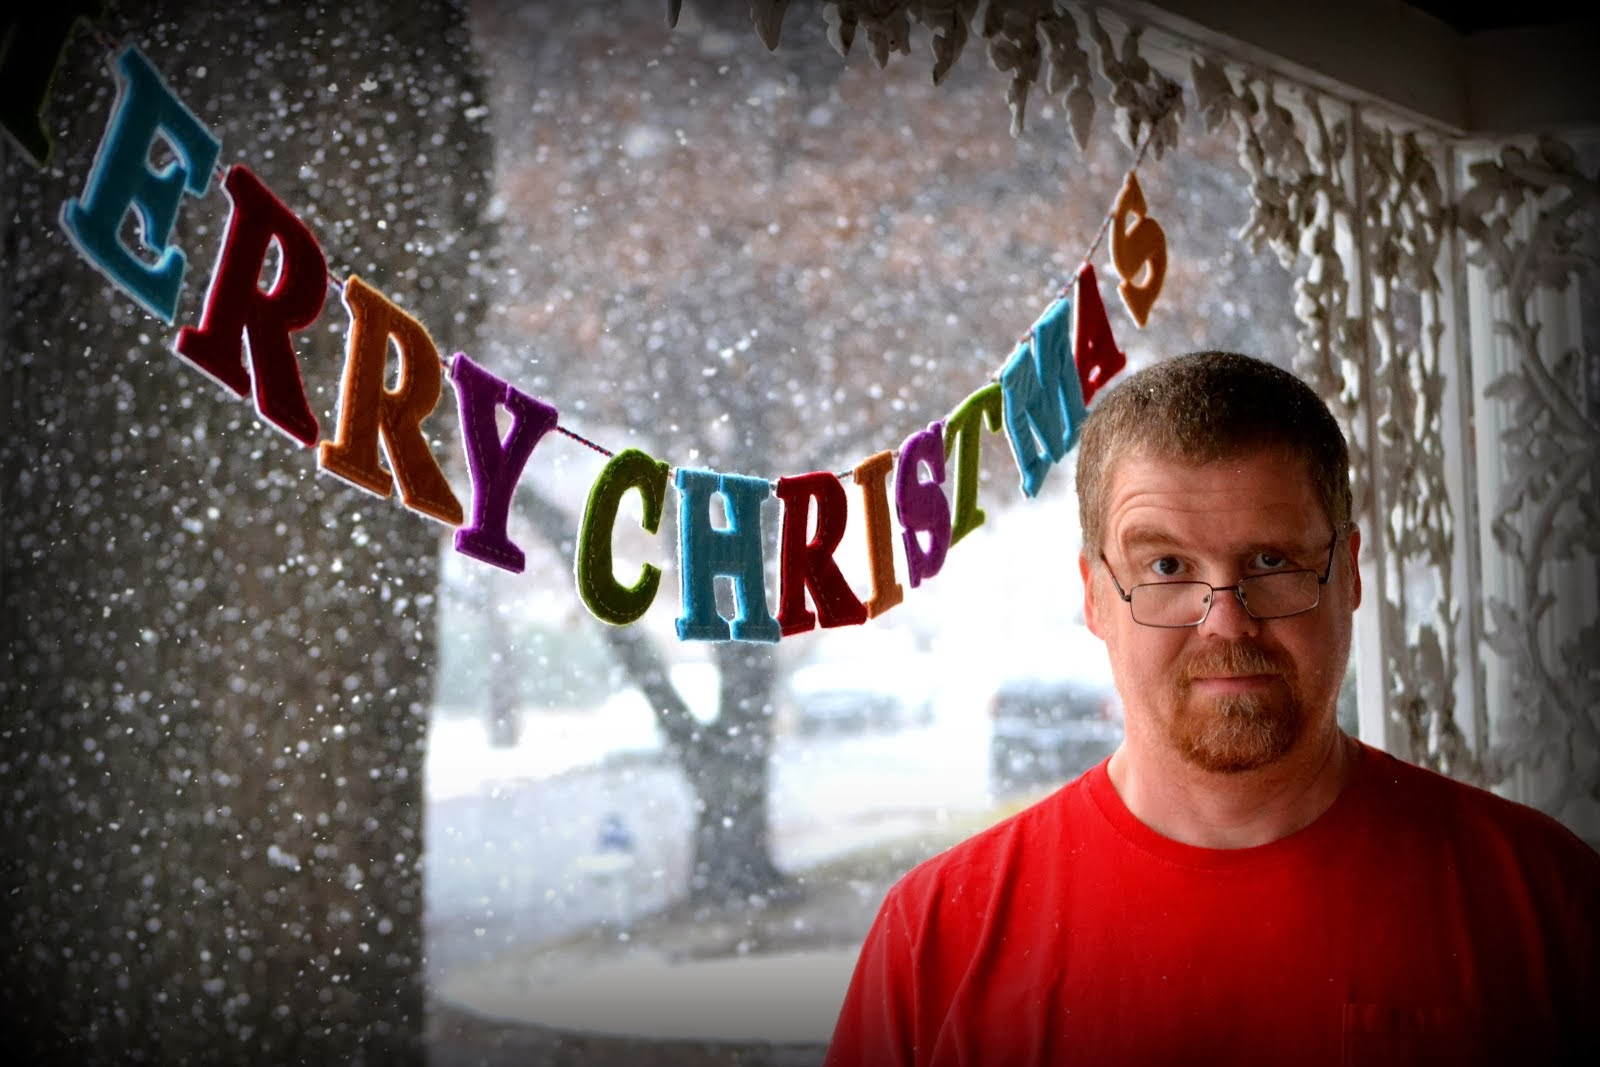 CHRISTmas Snow 2012